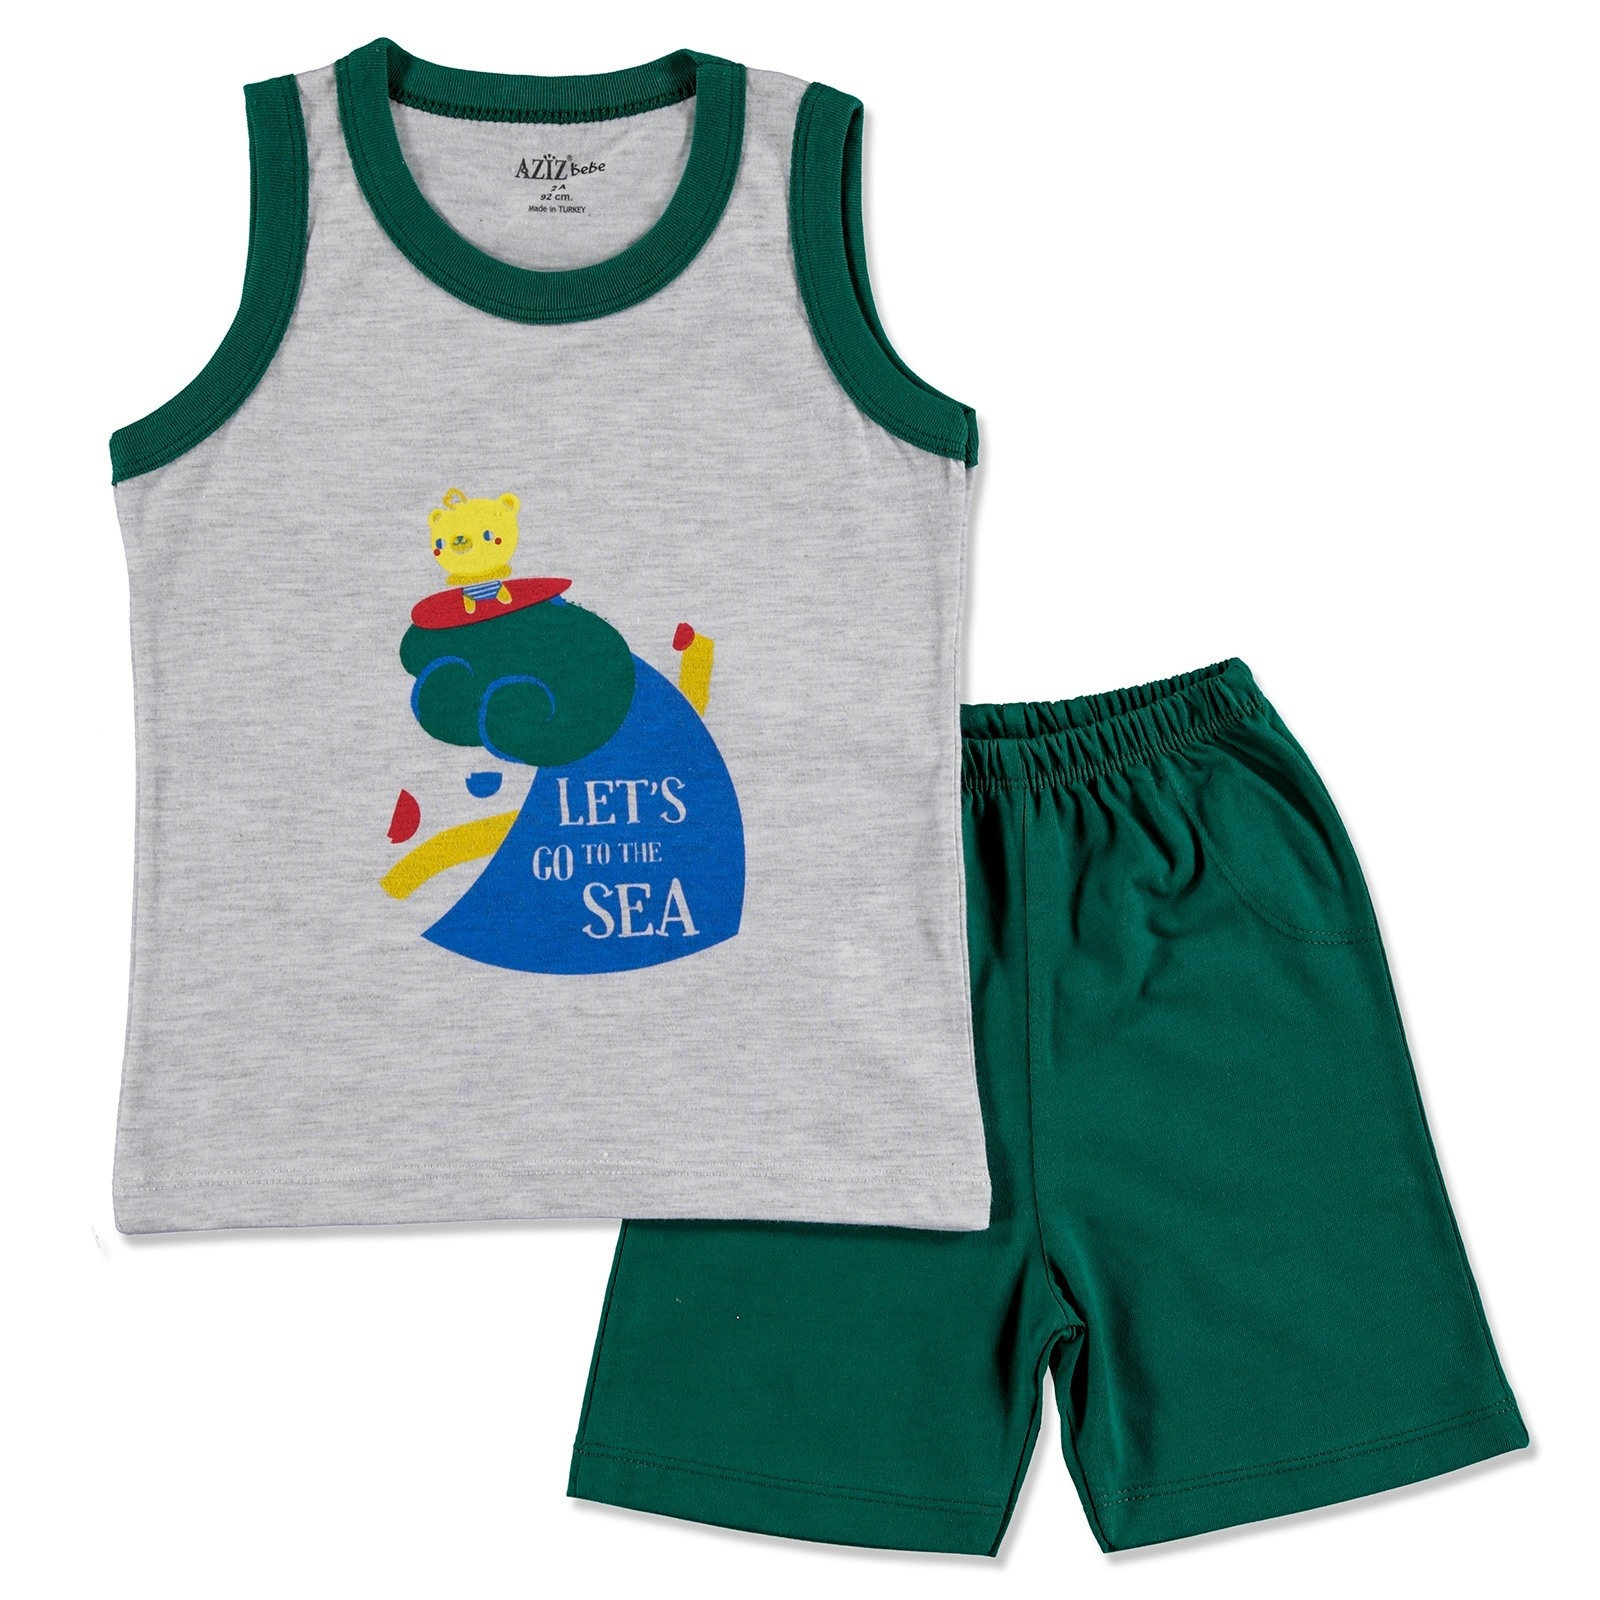 Ebebek Aziz Bebe Summer Baby Boy Olympiad Supreme T-shirt Short 2 Pcs Set